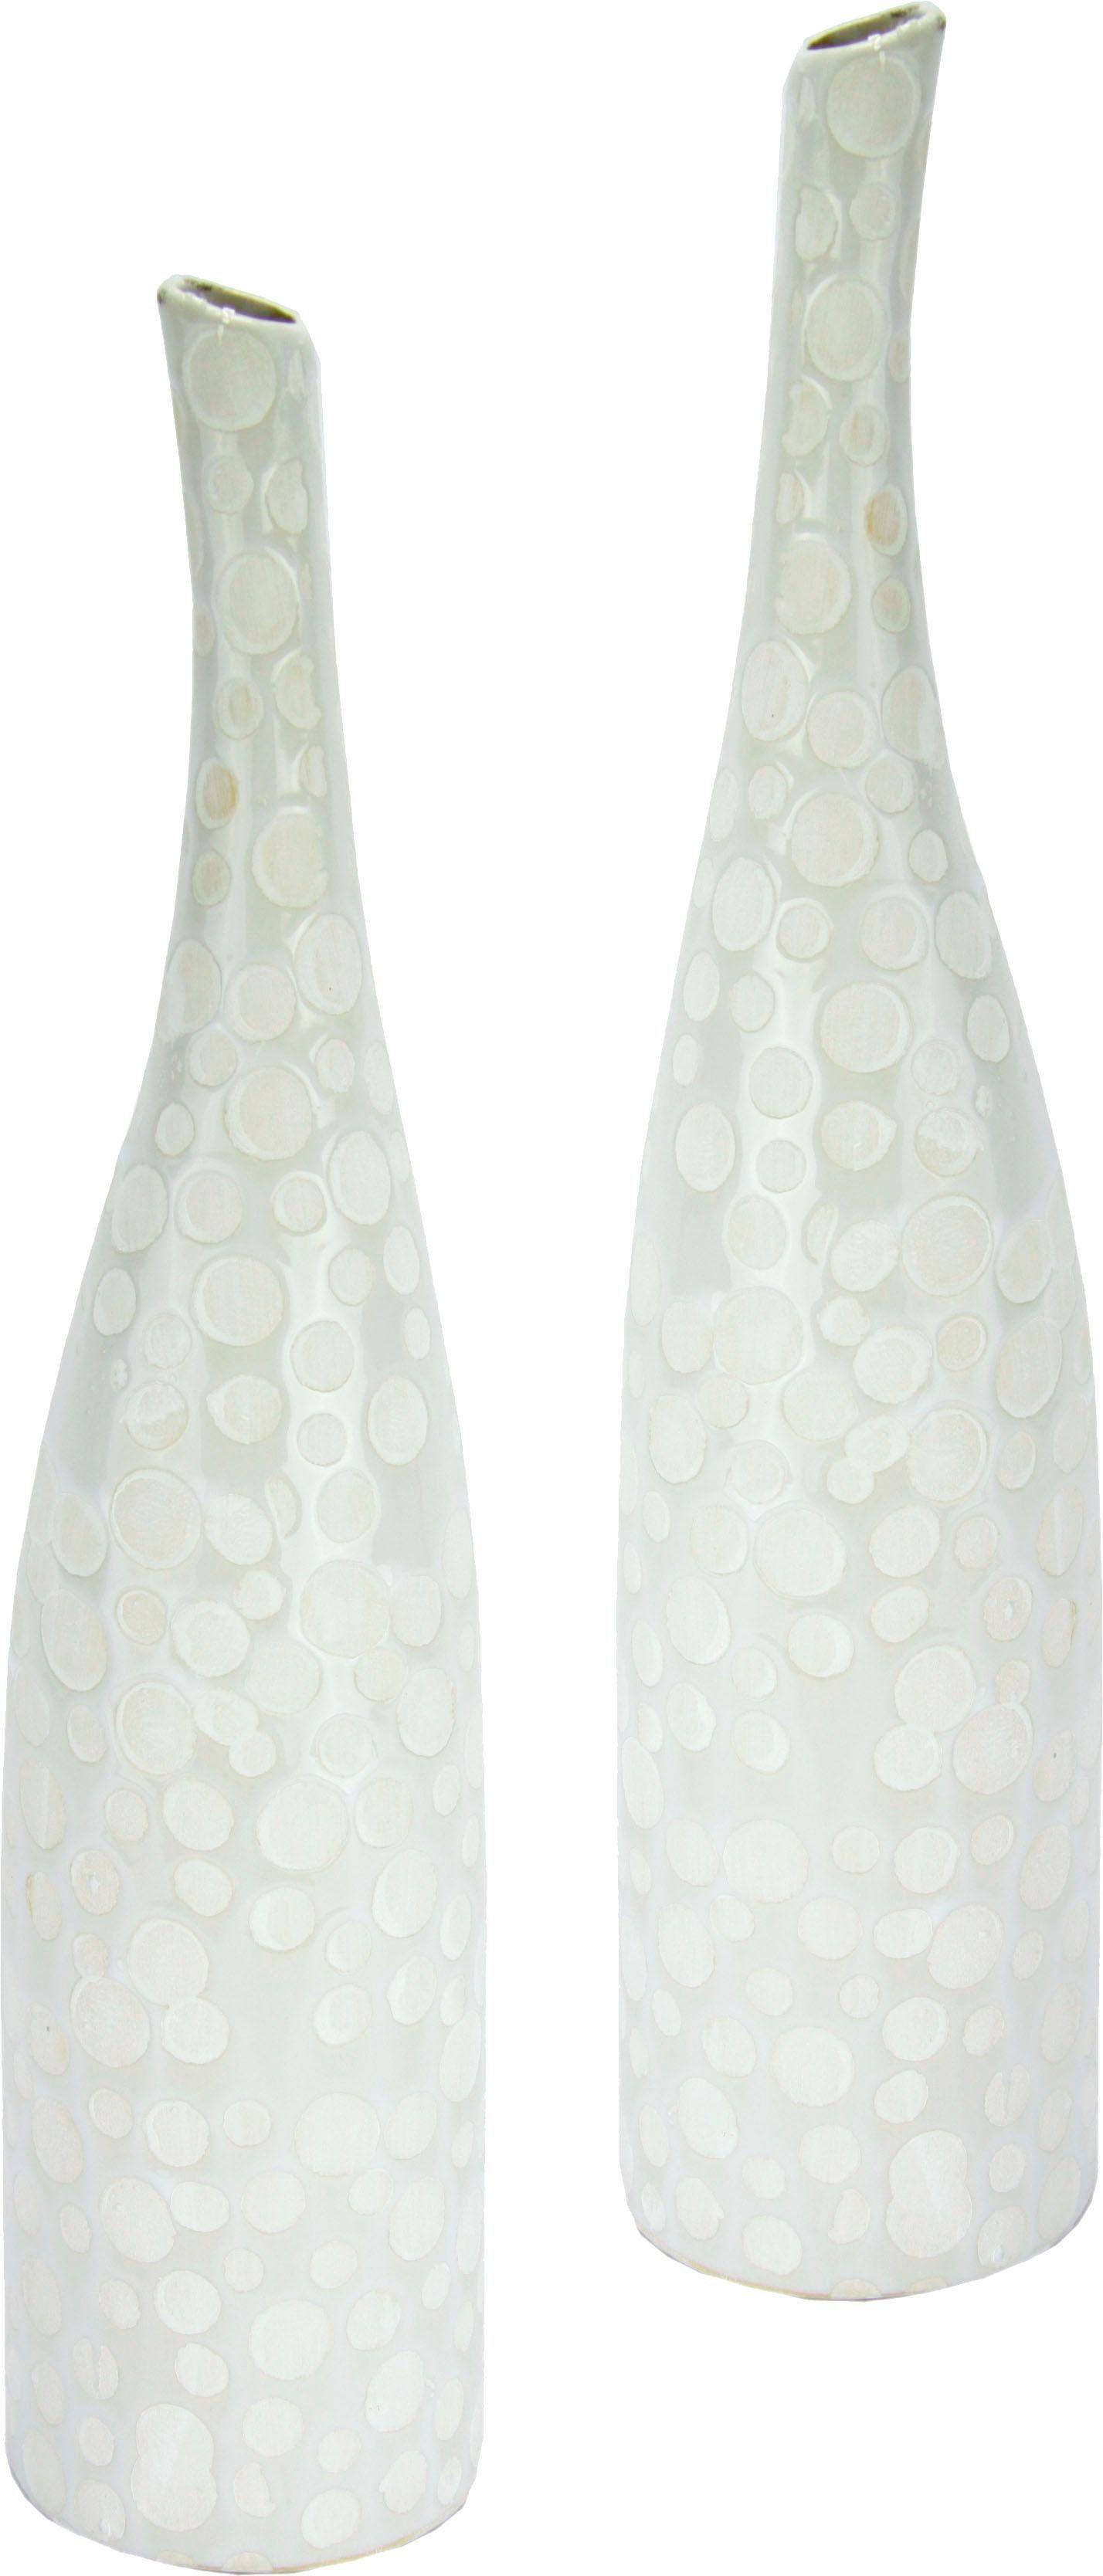 Home Affaire Keramik-Vase, Höhe 42 cm (2er Set)